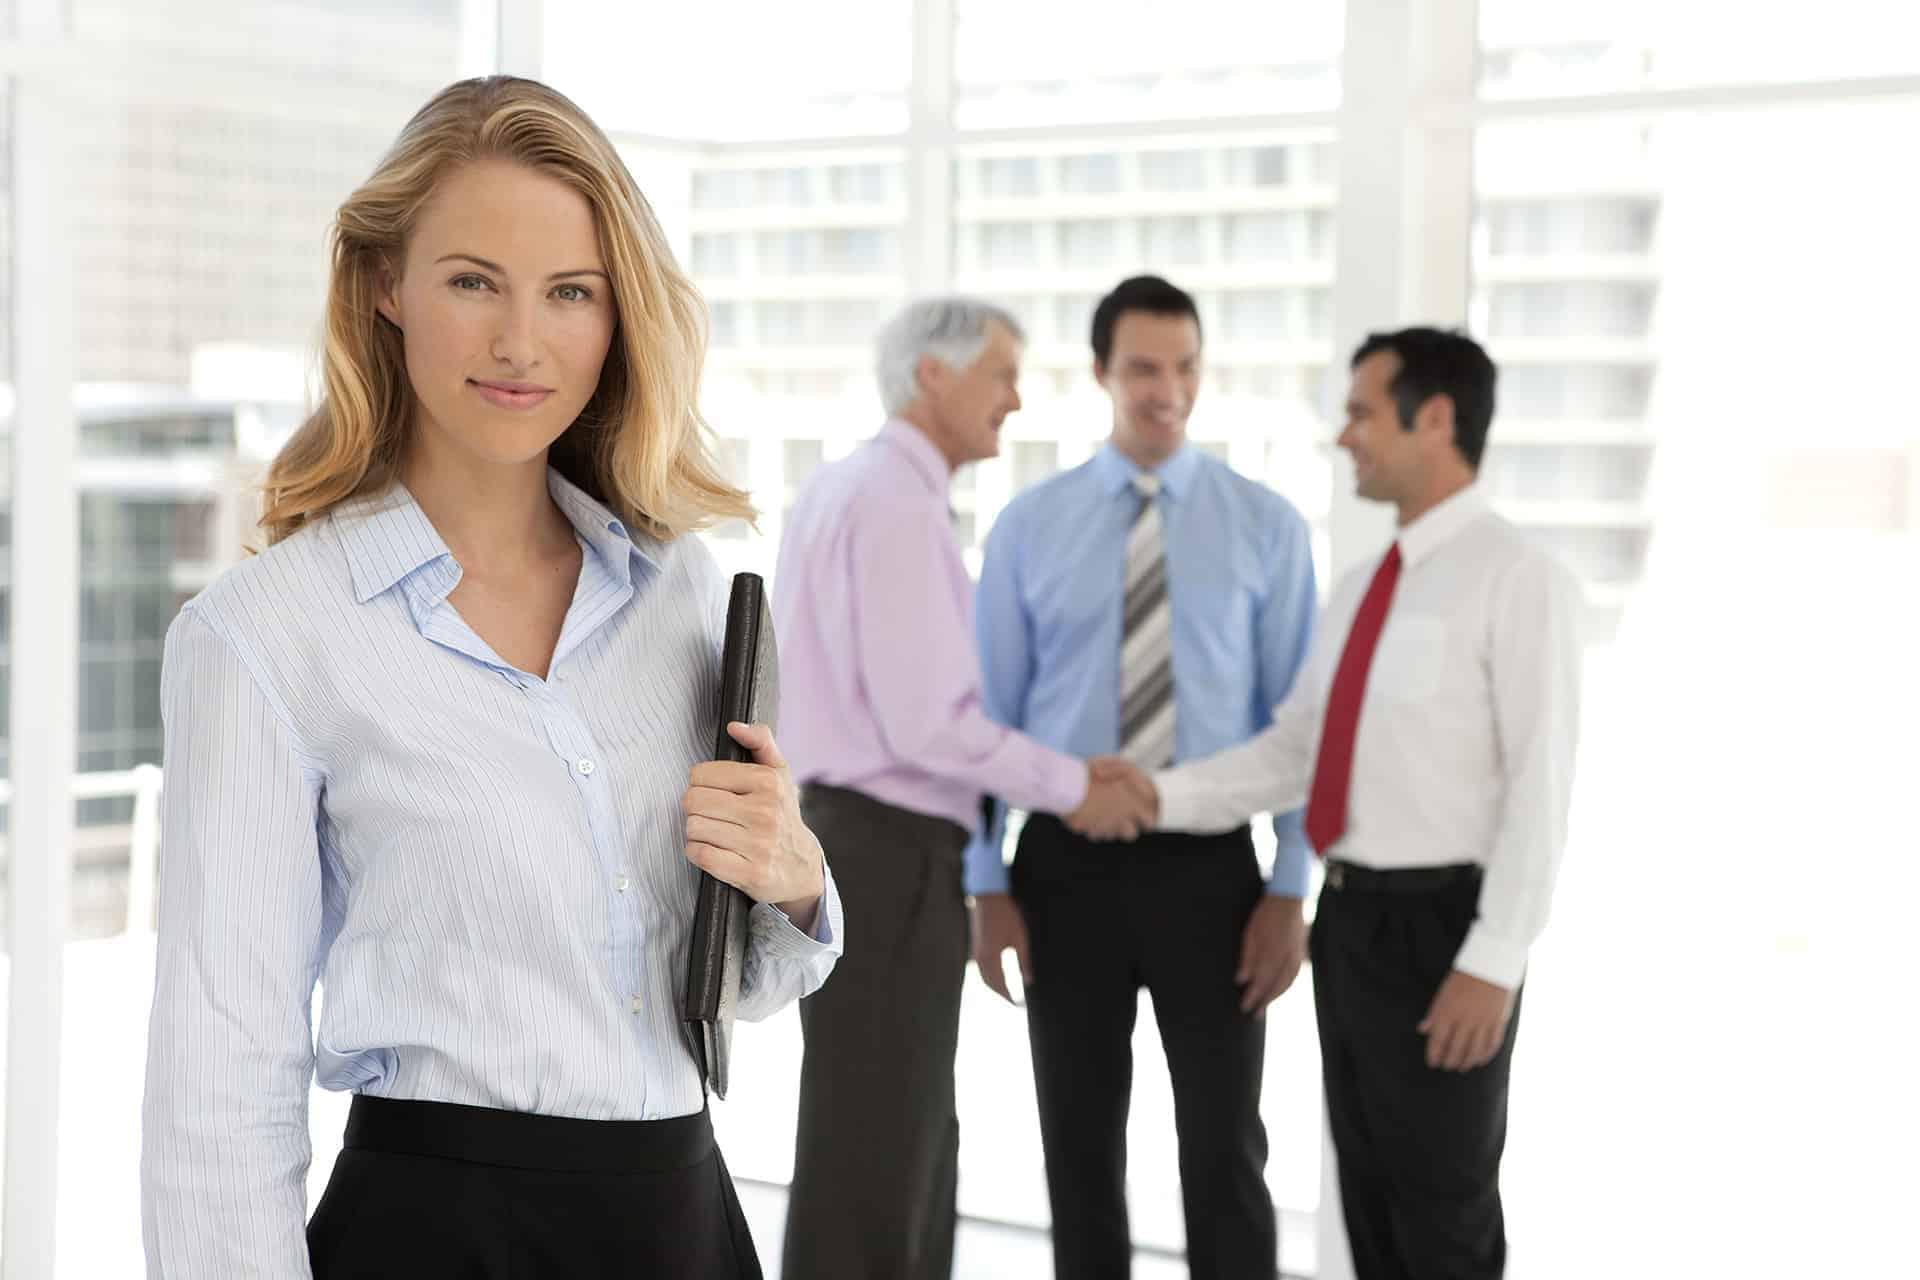 trabaja-en-futurocasa-inmobiliaria-madrid